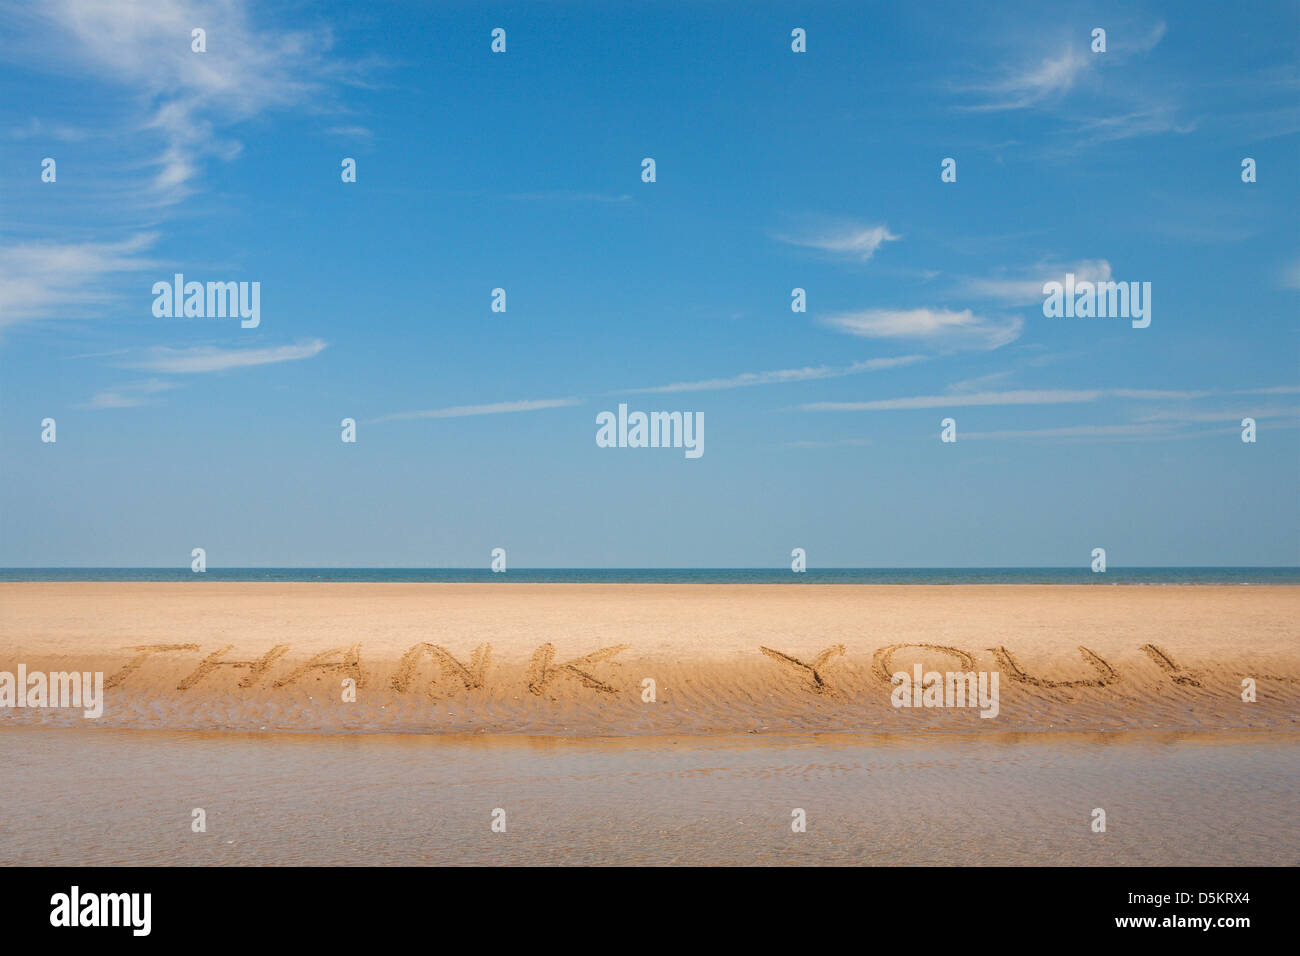 THANK YOU; MESSAGE; WRITTEN; BEACH; COMMUNICATION; SAND; WRITING - Stock Image